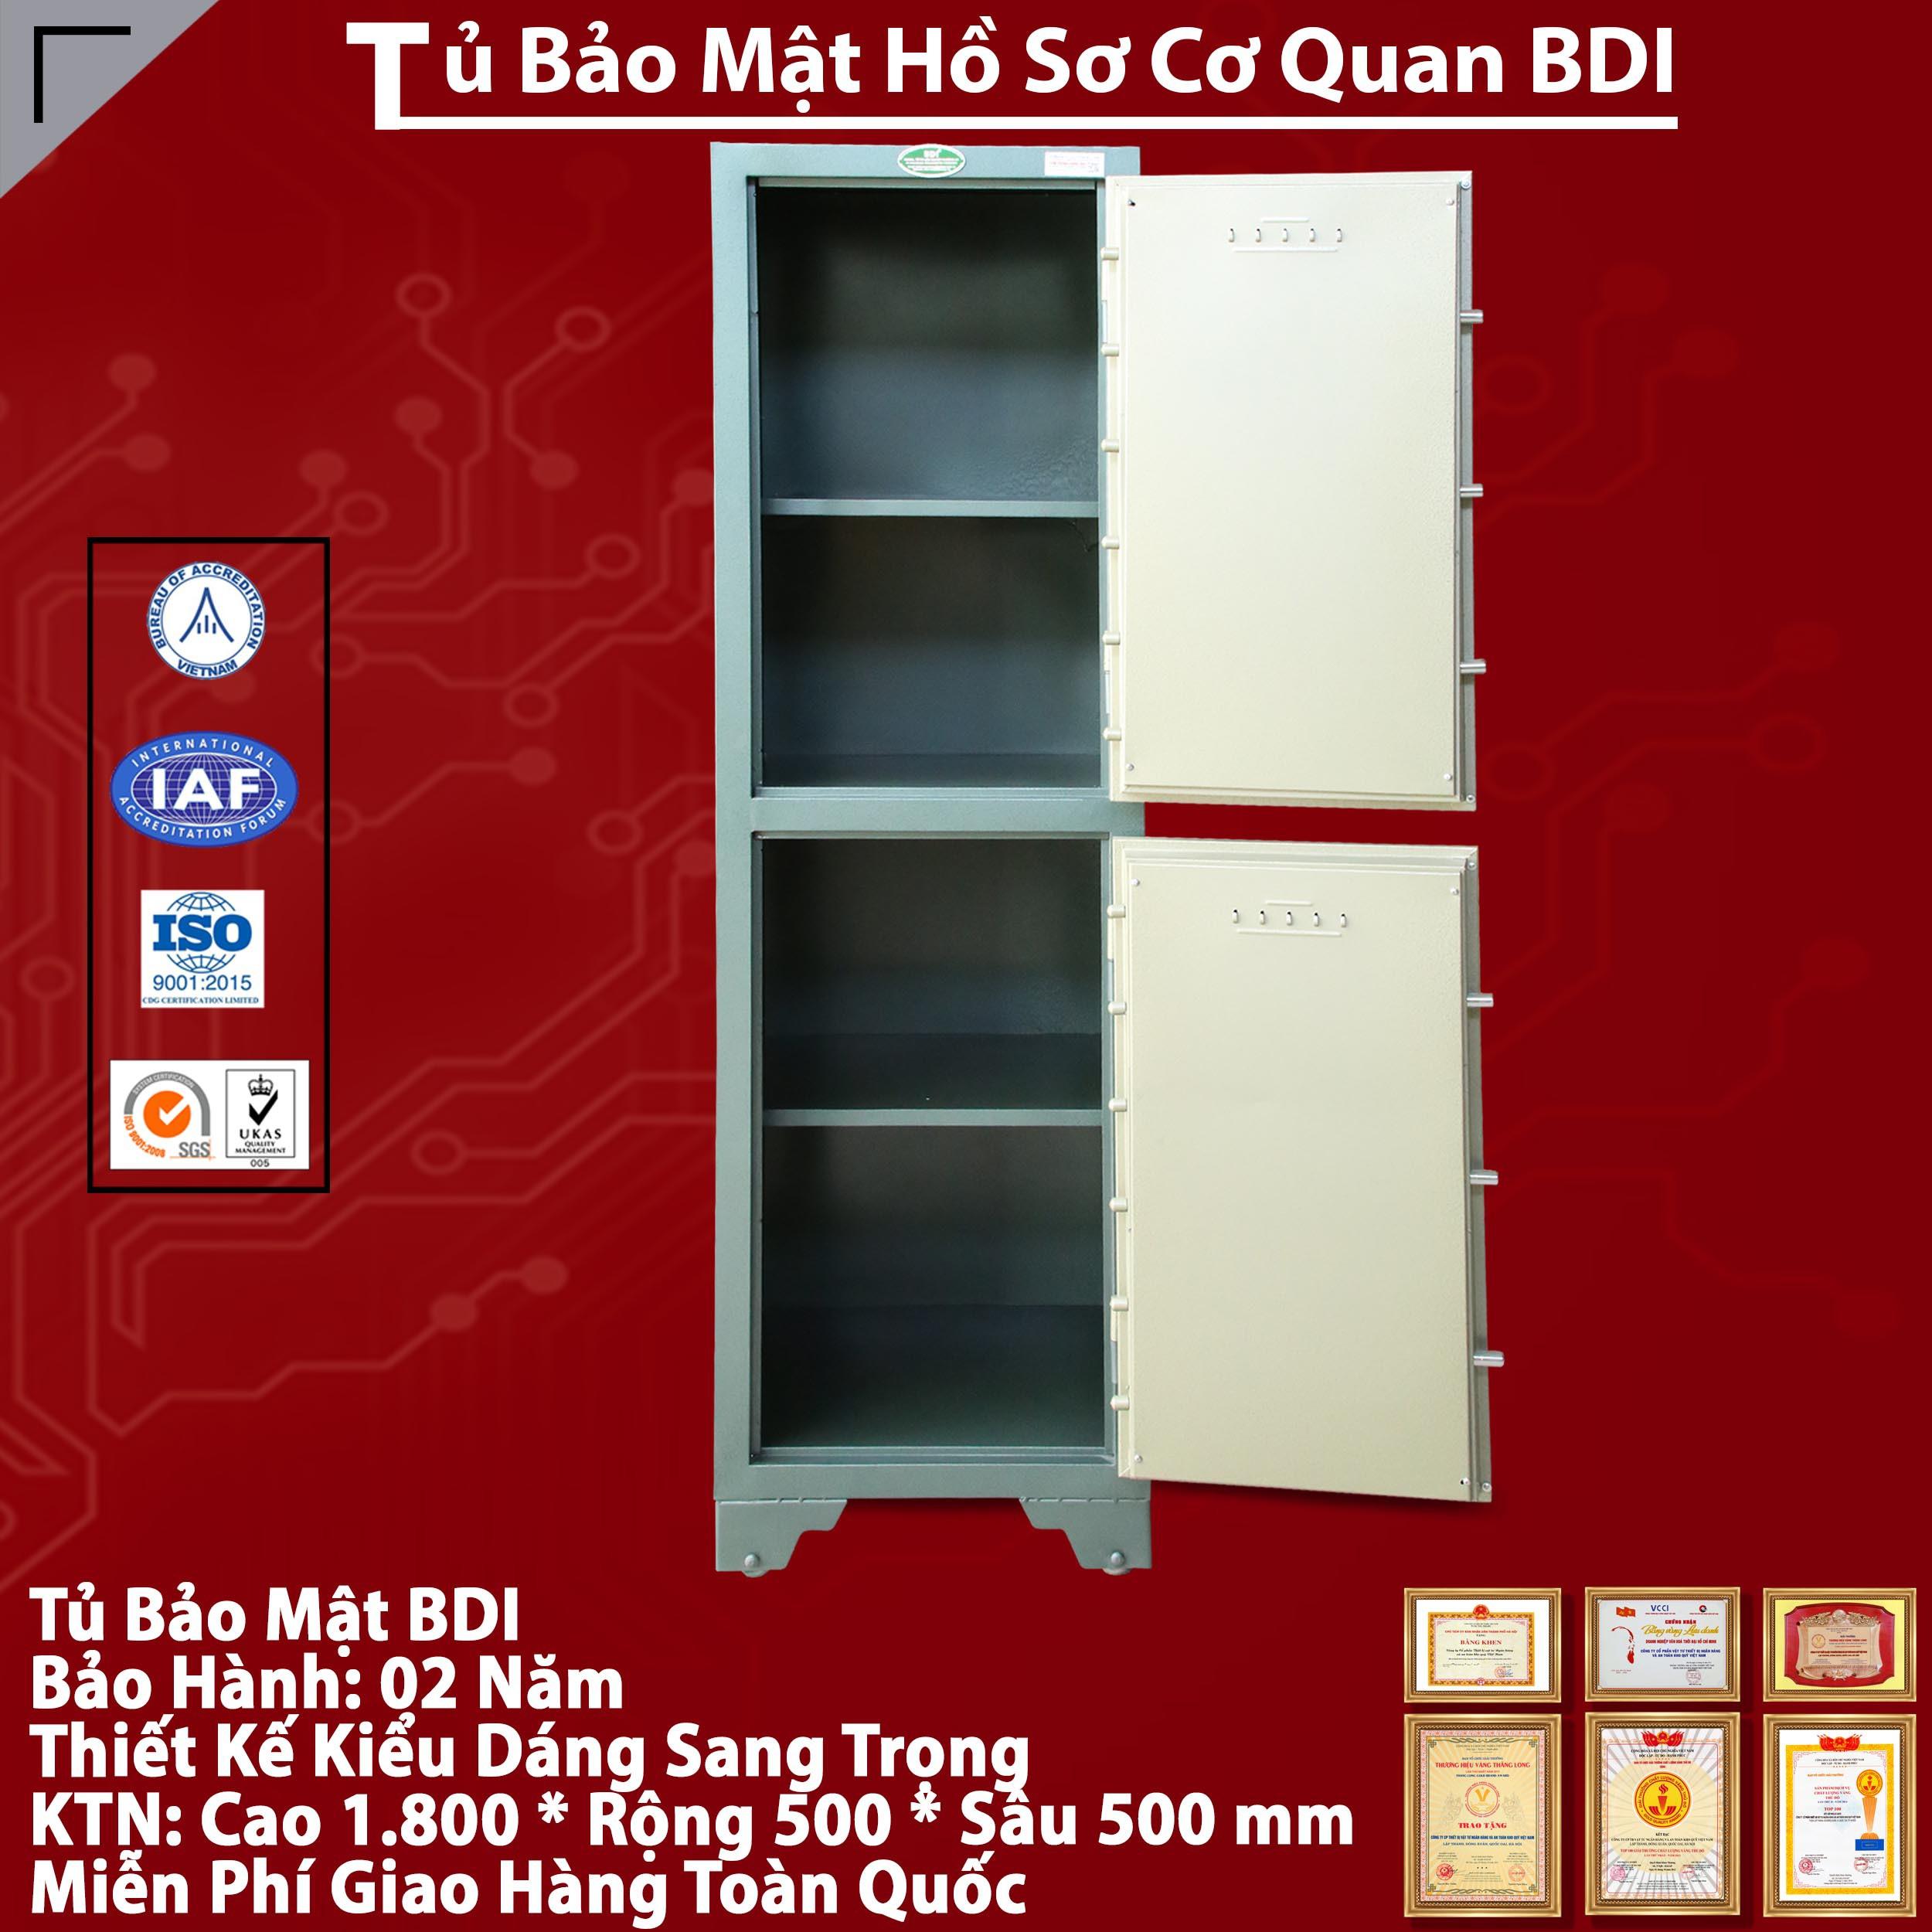 Tu Bao Mat 2 Canh Chinh Hang Moi Nhat